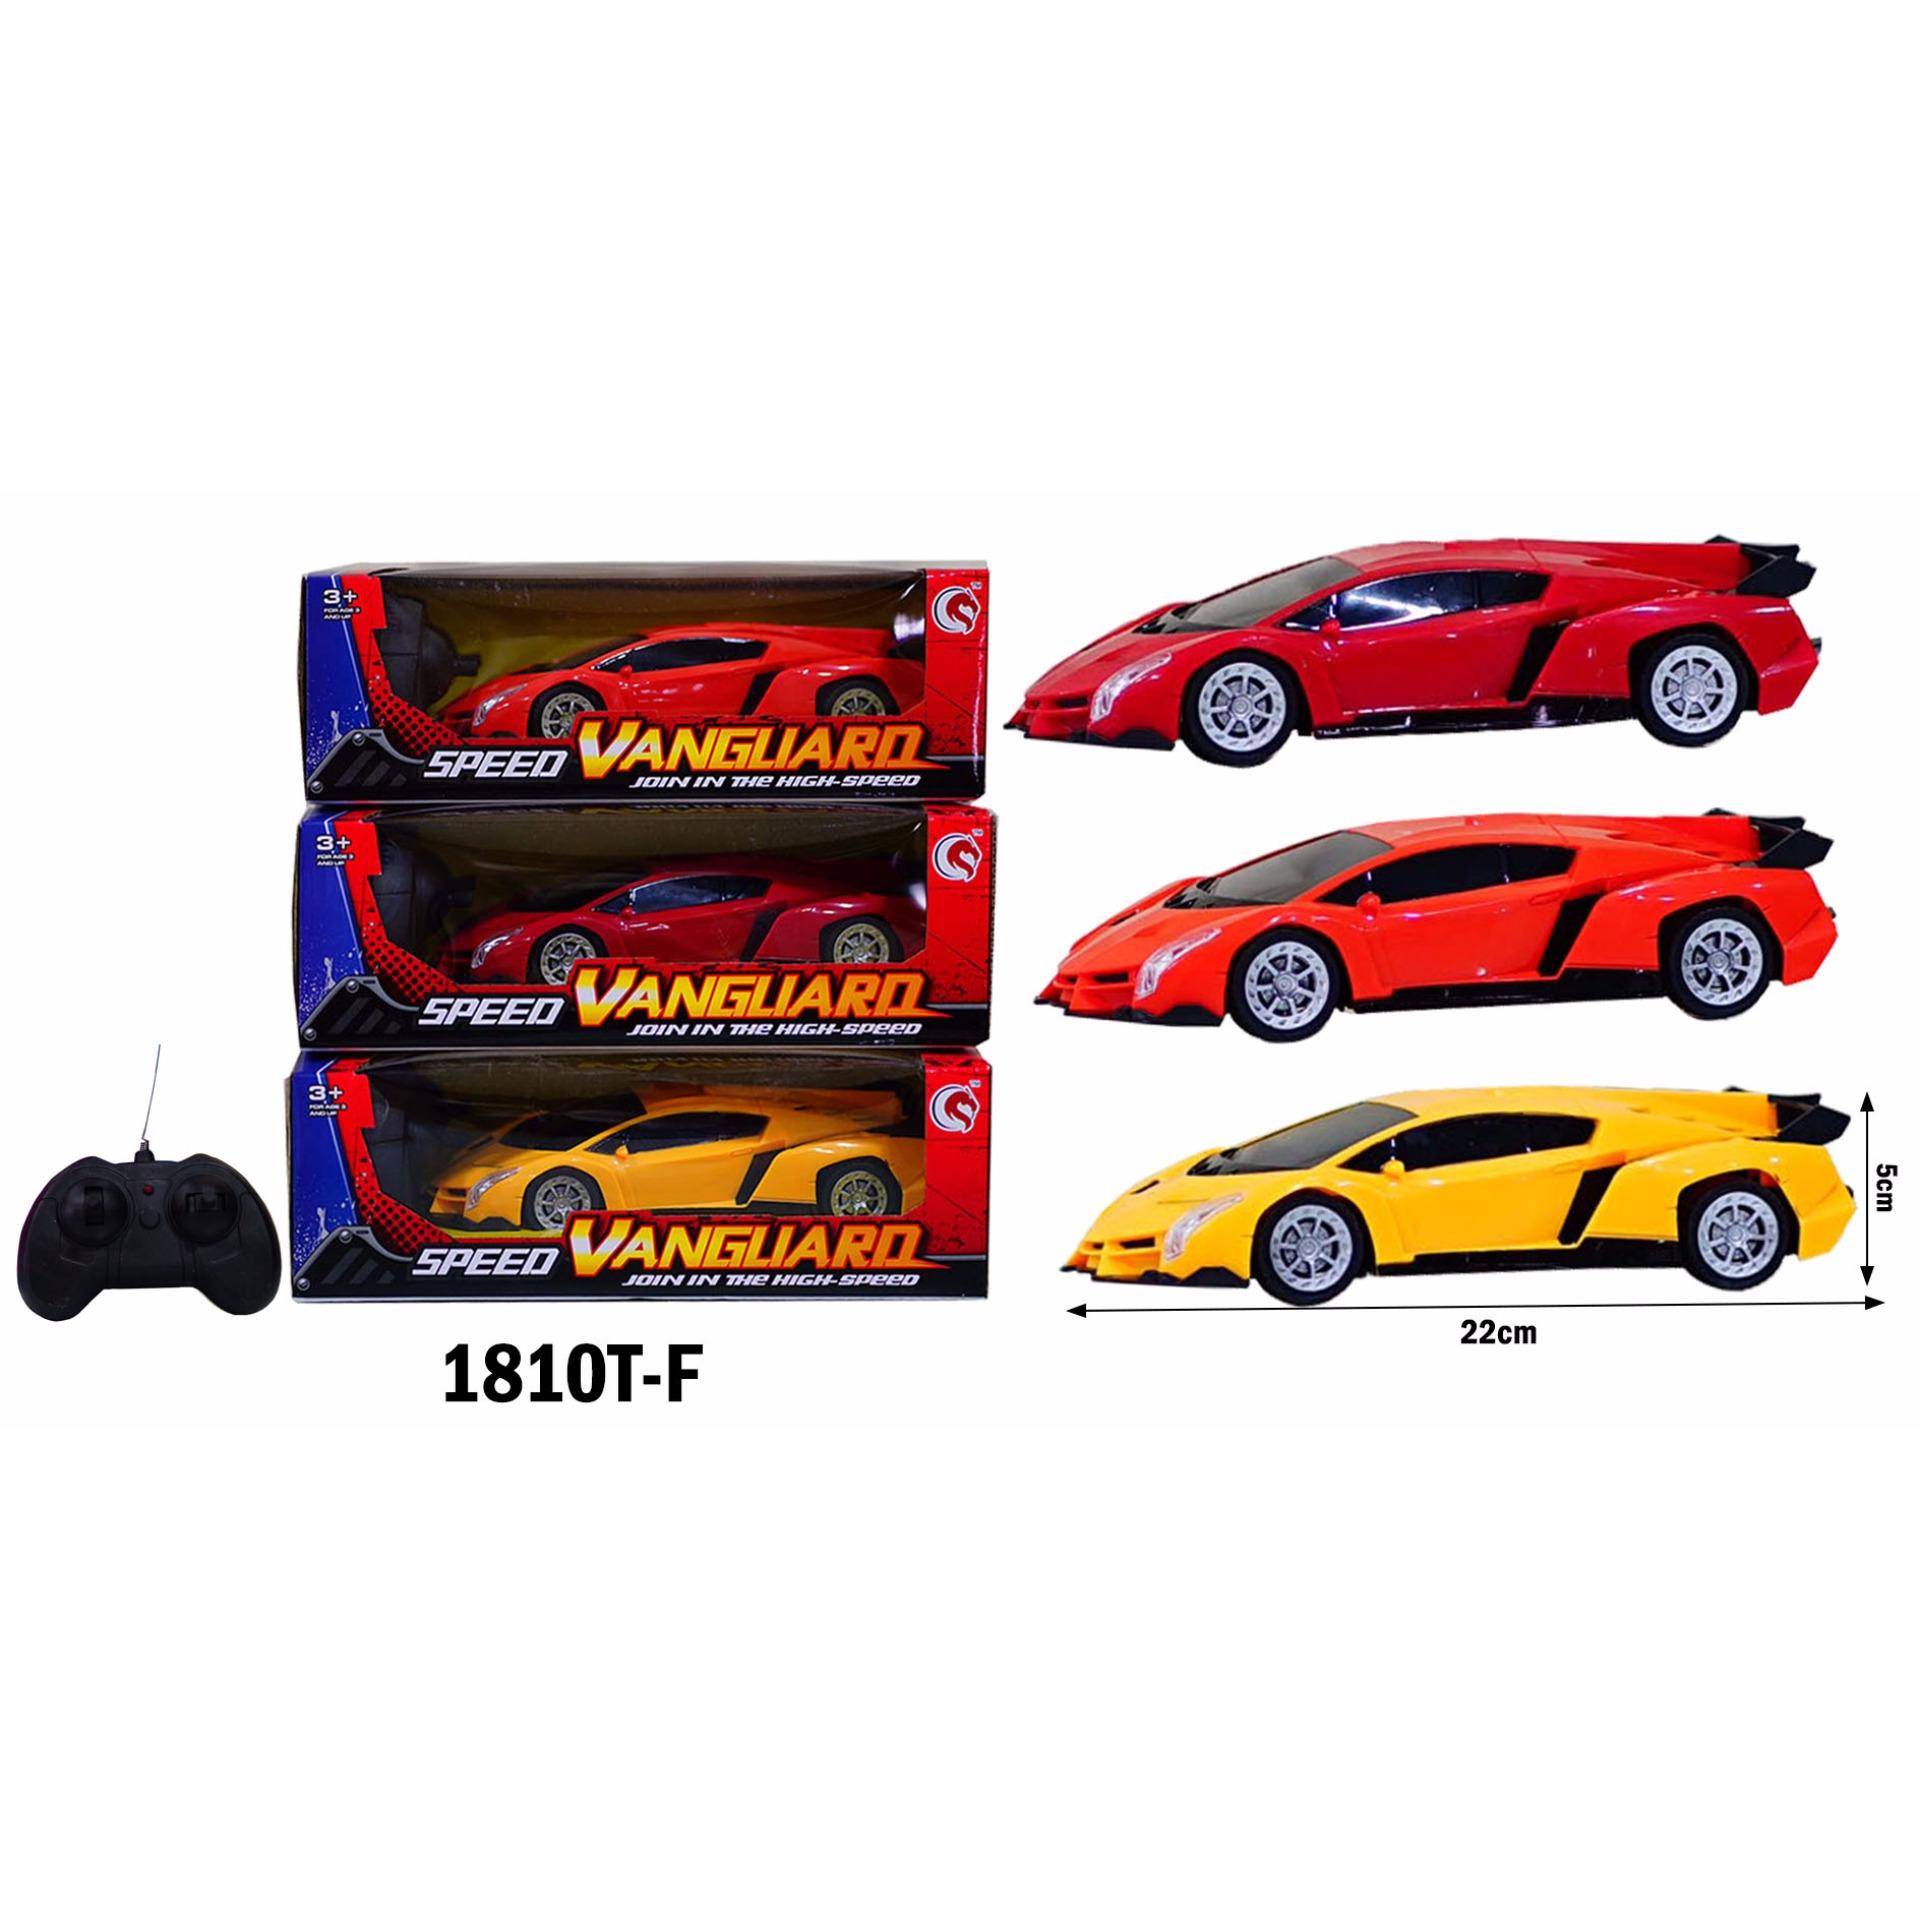 Spek Mainan Anak Rc Mobil Remot Speed Vanguard Lambo 1810T V Warna Random